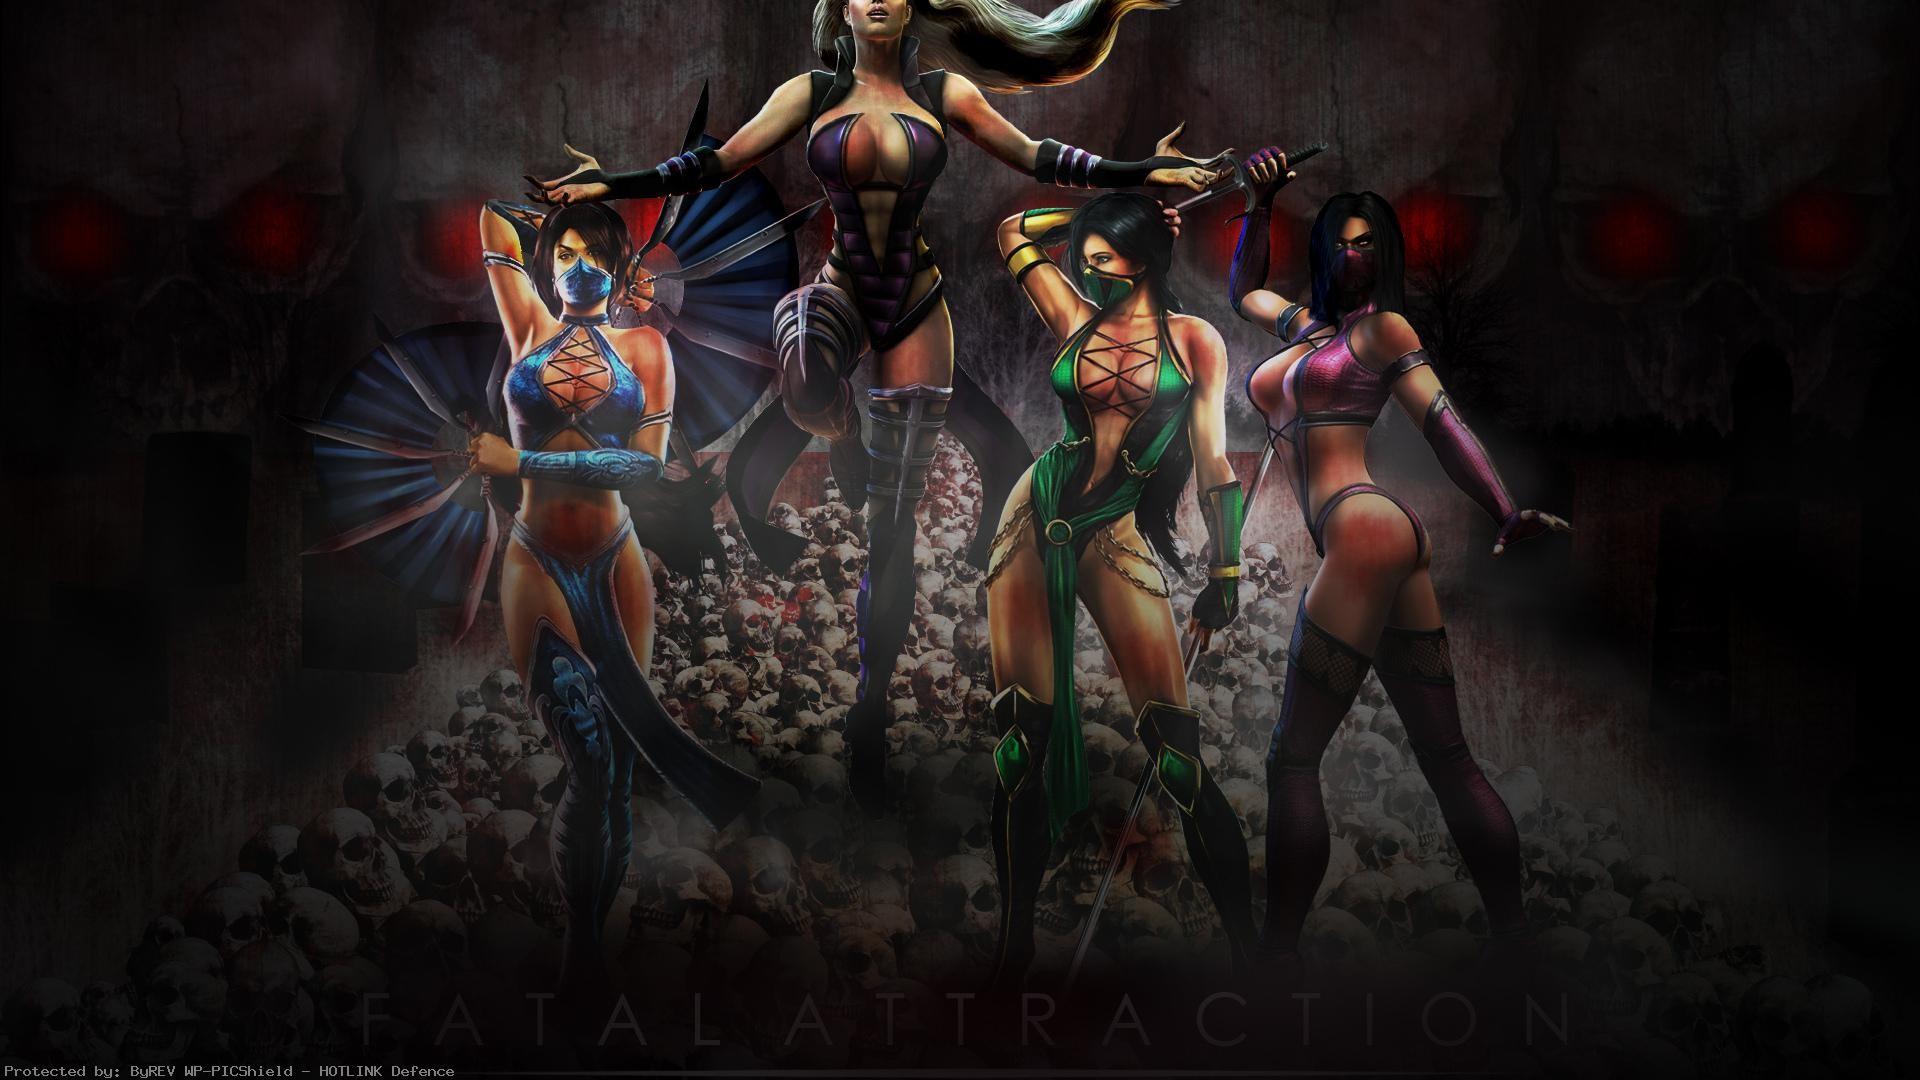 Download-1920×1080-Mortal-Kombat-Mileena-Kita-wallpaper-wp60013550